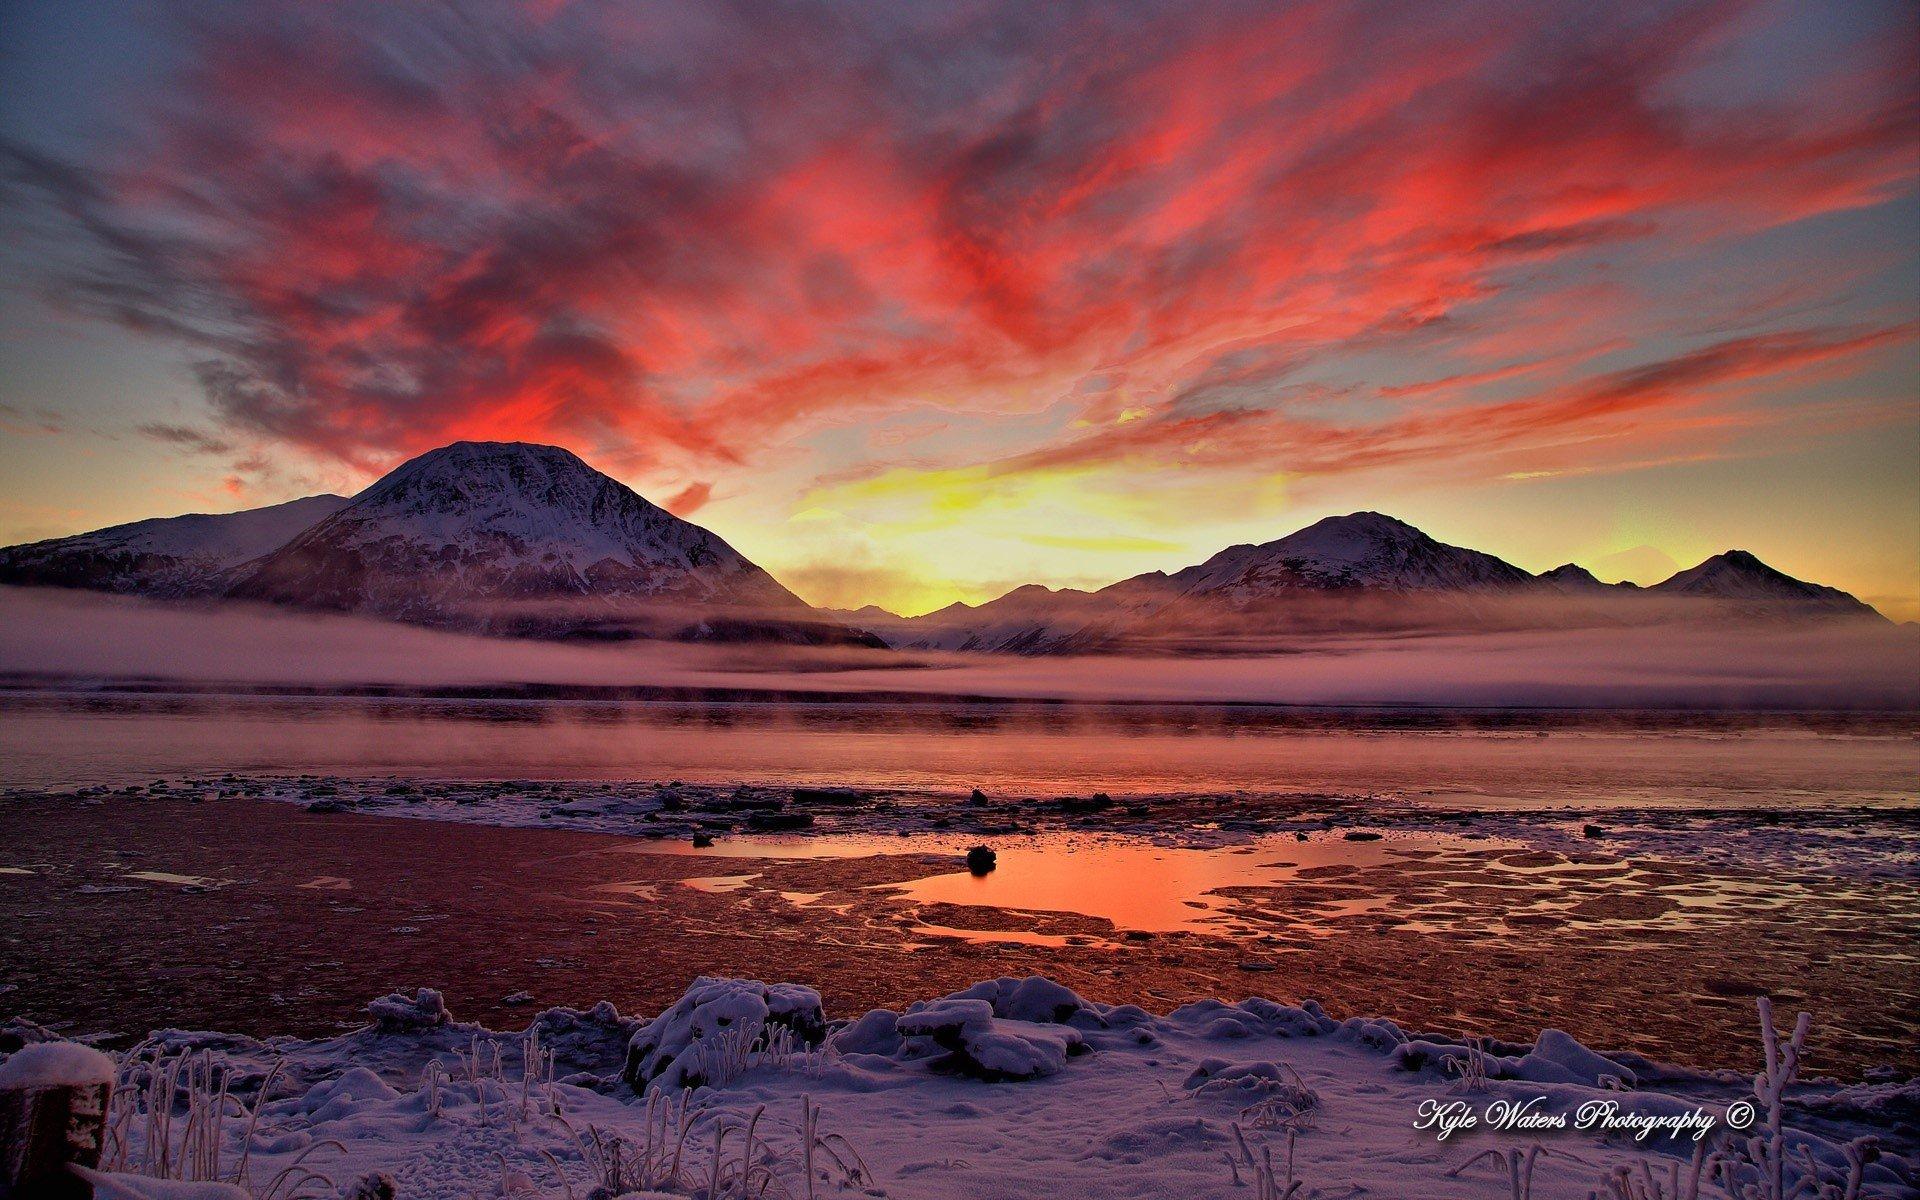 Wallpaper Un atardecer en Alaska Images